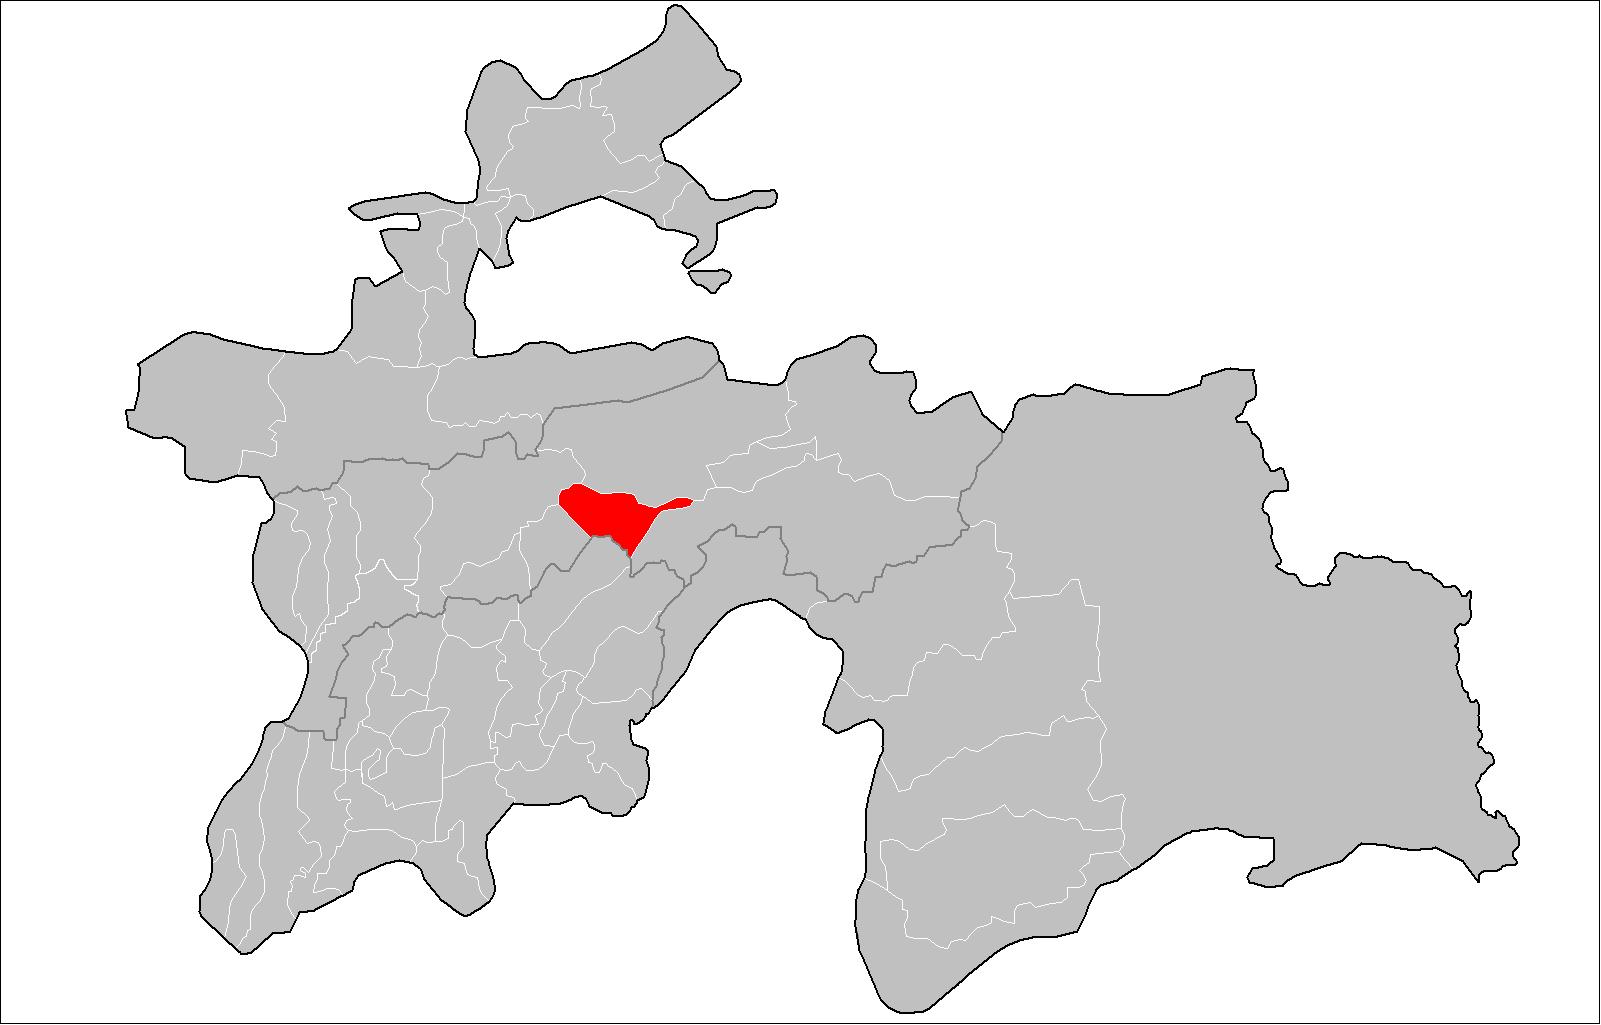 ناحیه نورآباد